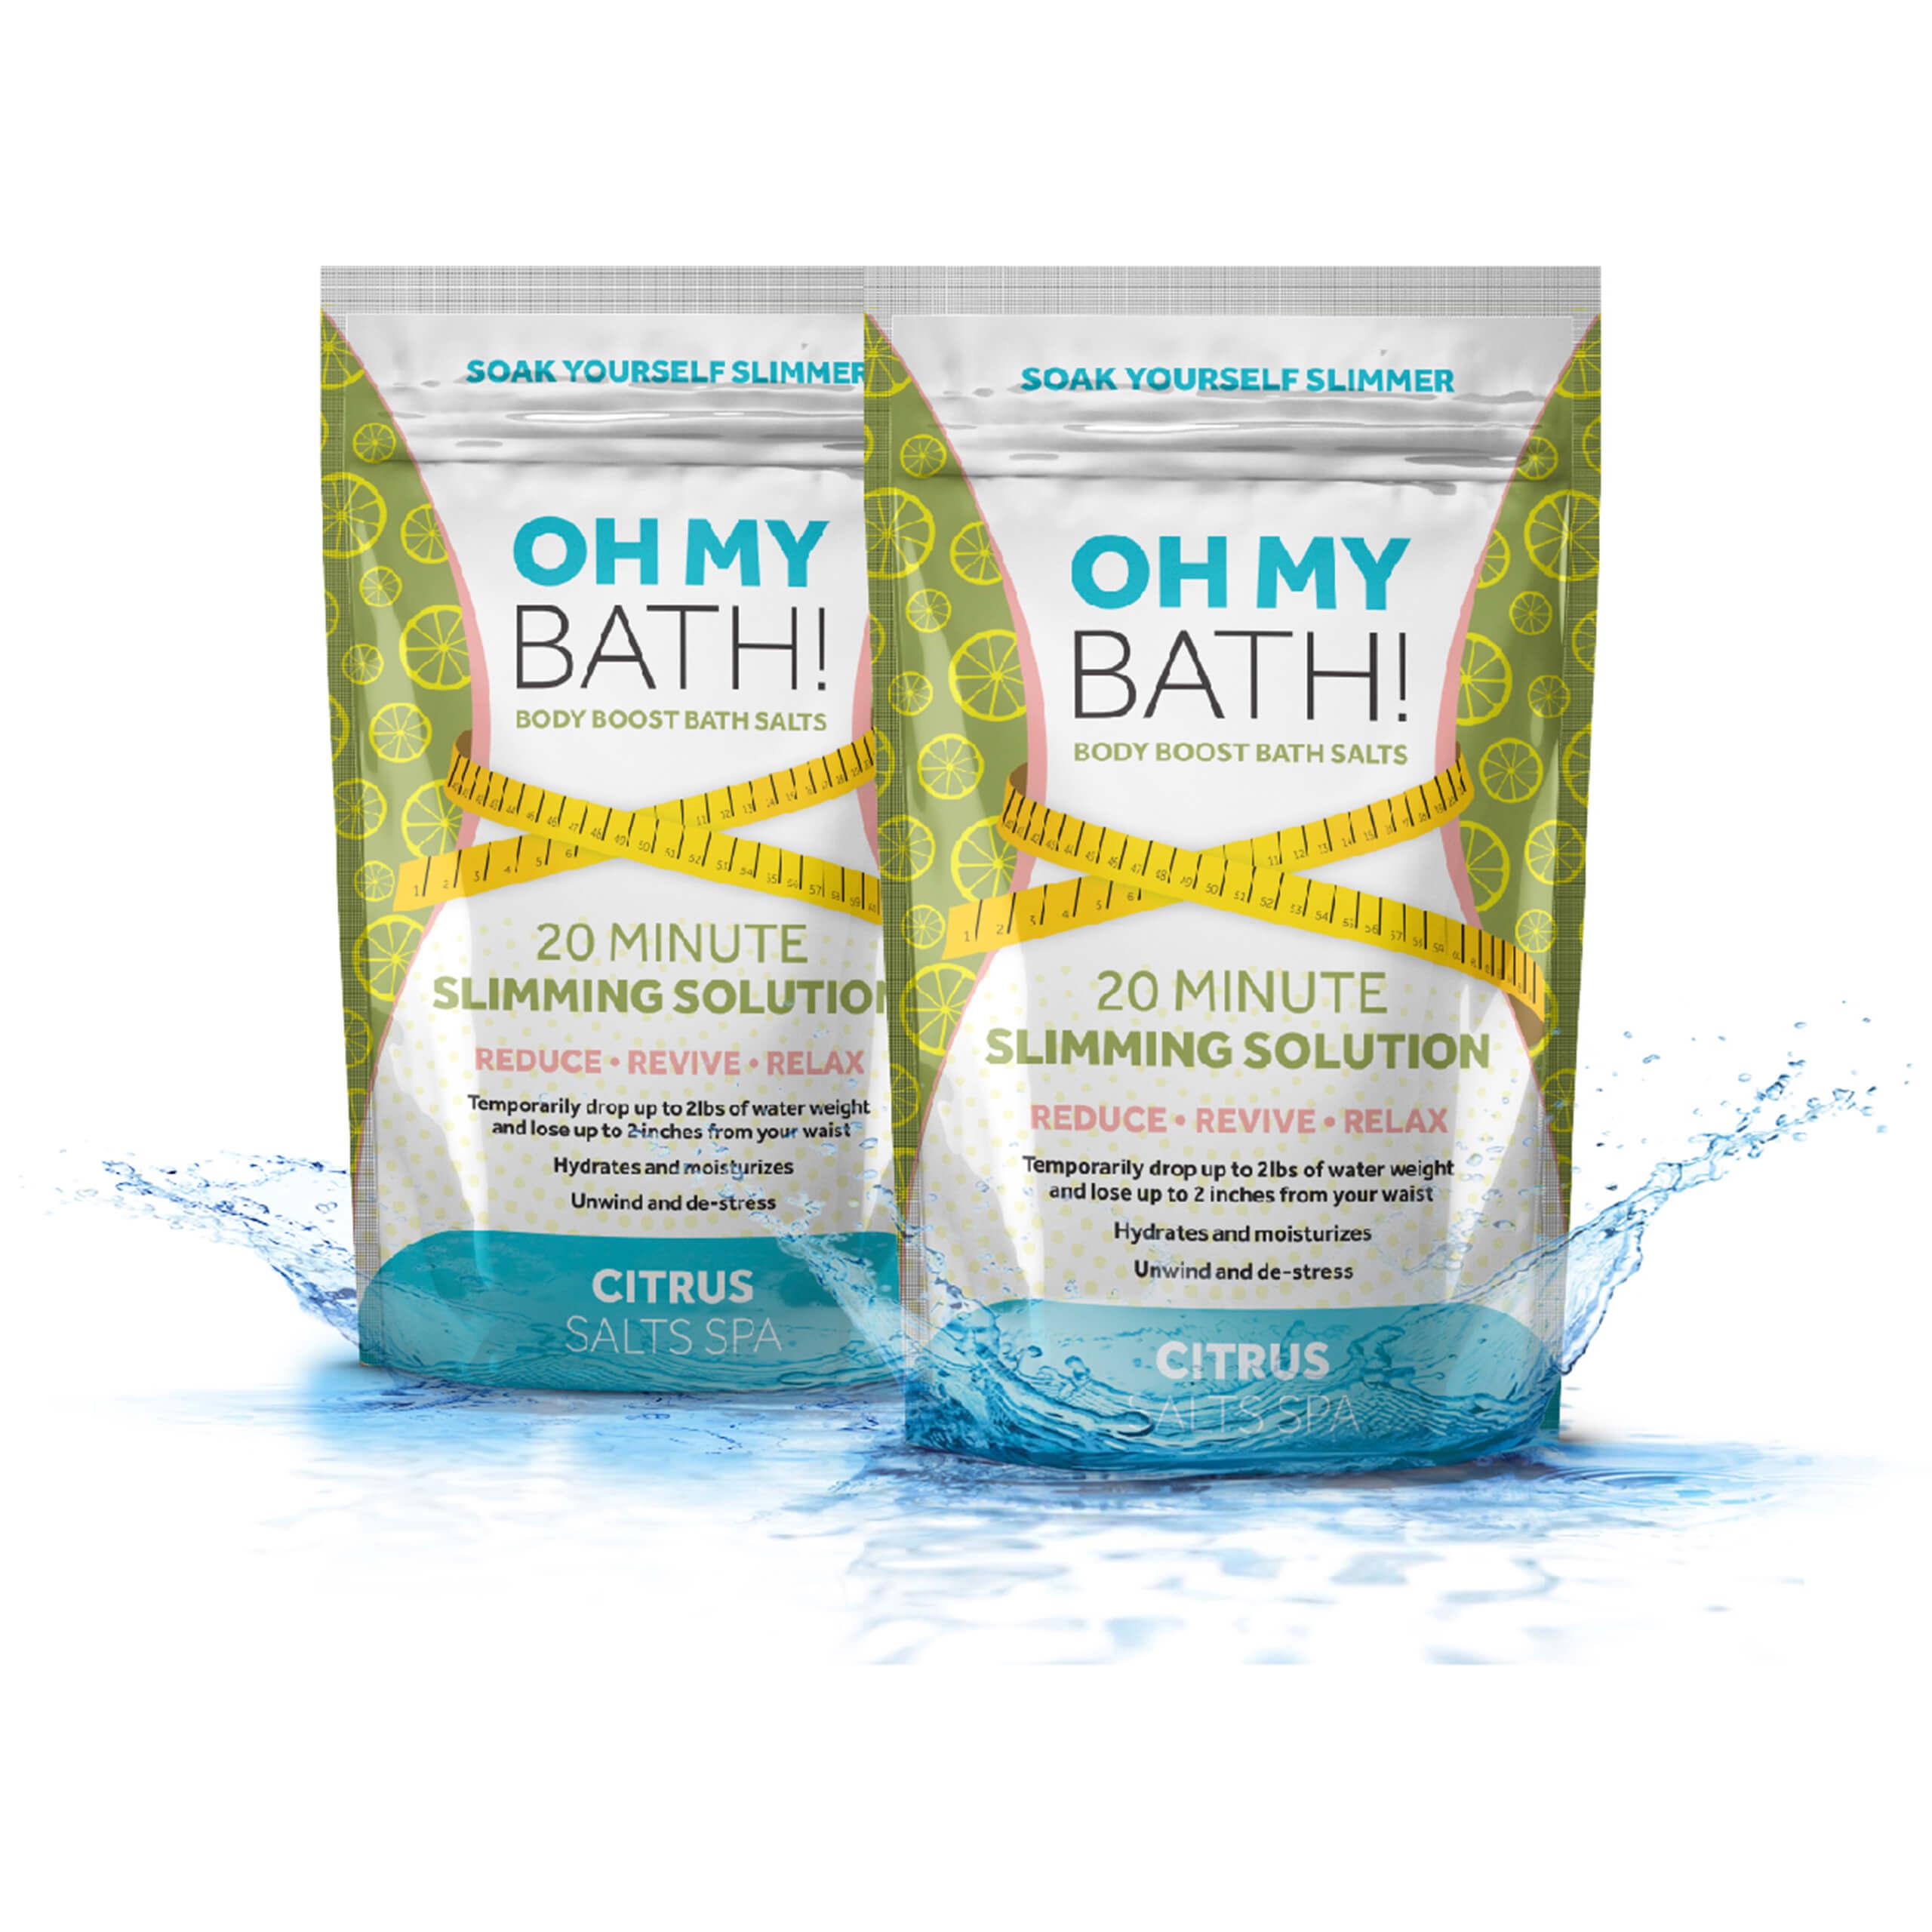 Oh My Bath | Körperboost Badesalz | Set 2-tlg.